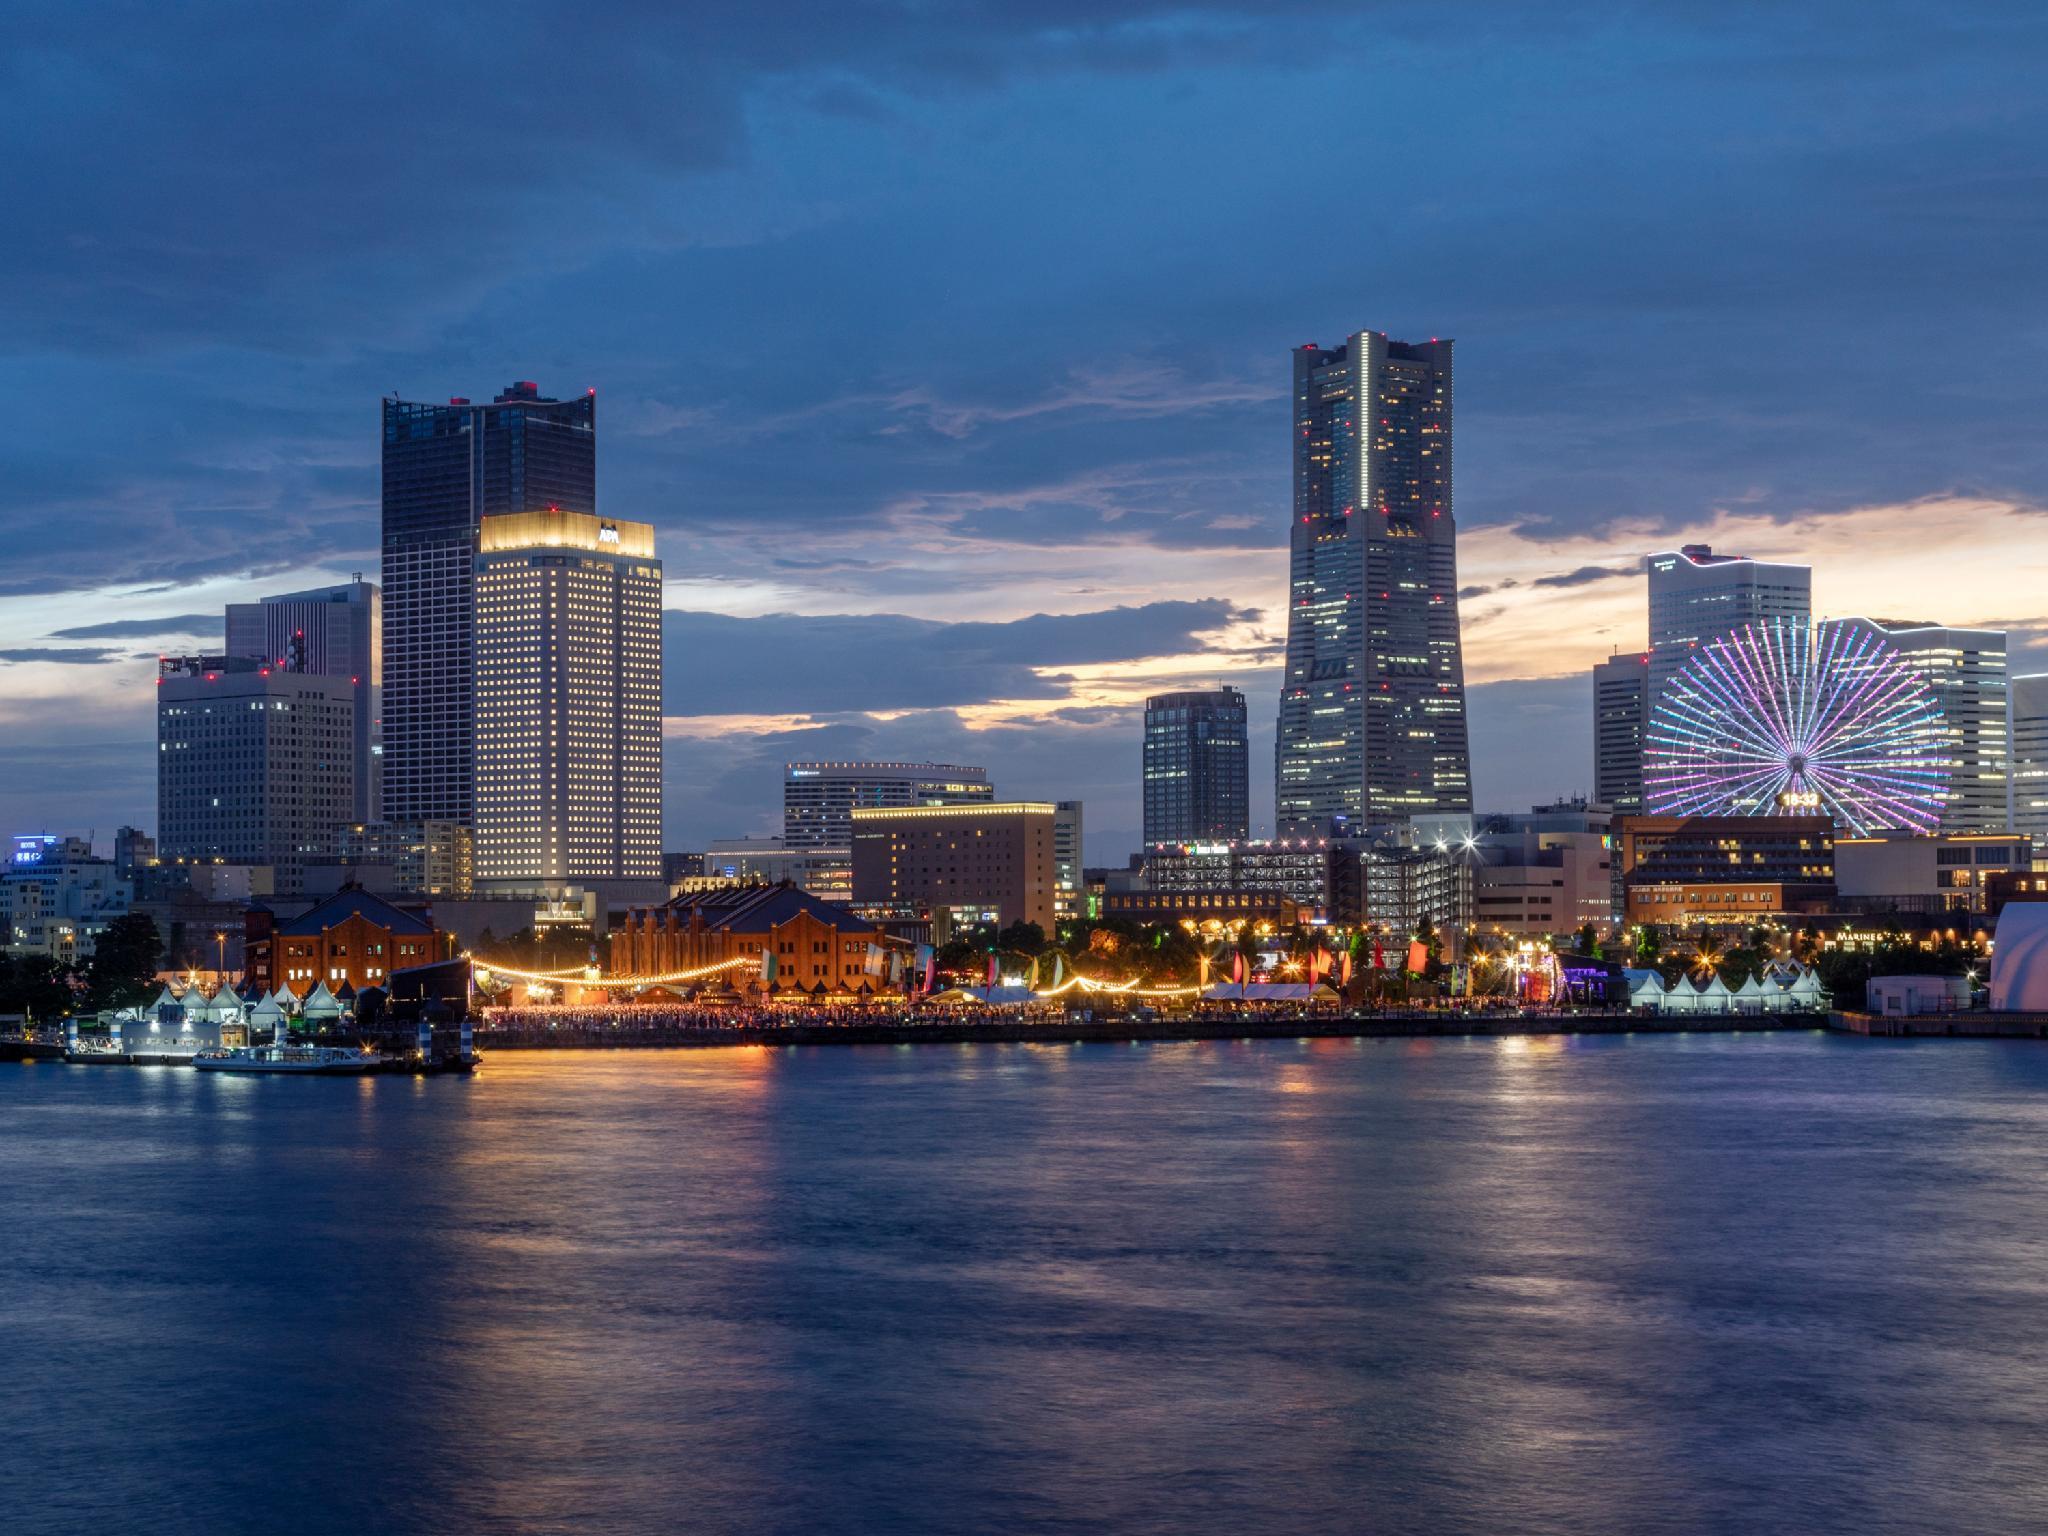 APA Hotel And Resort Yokohama Bay Tower